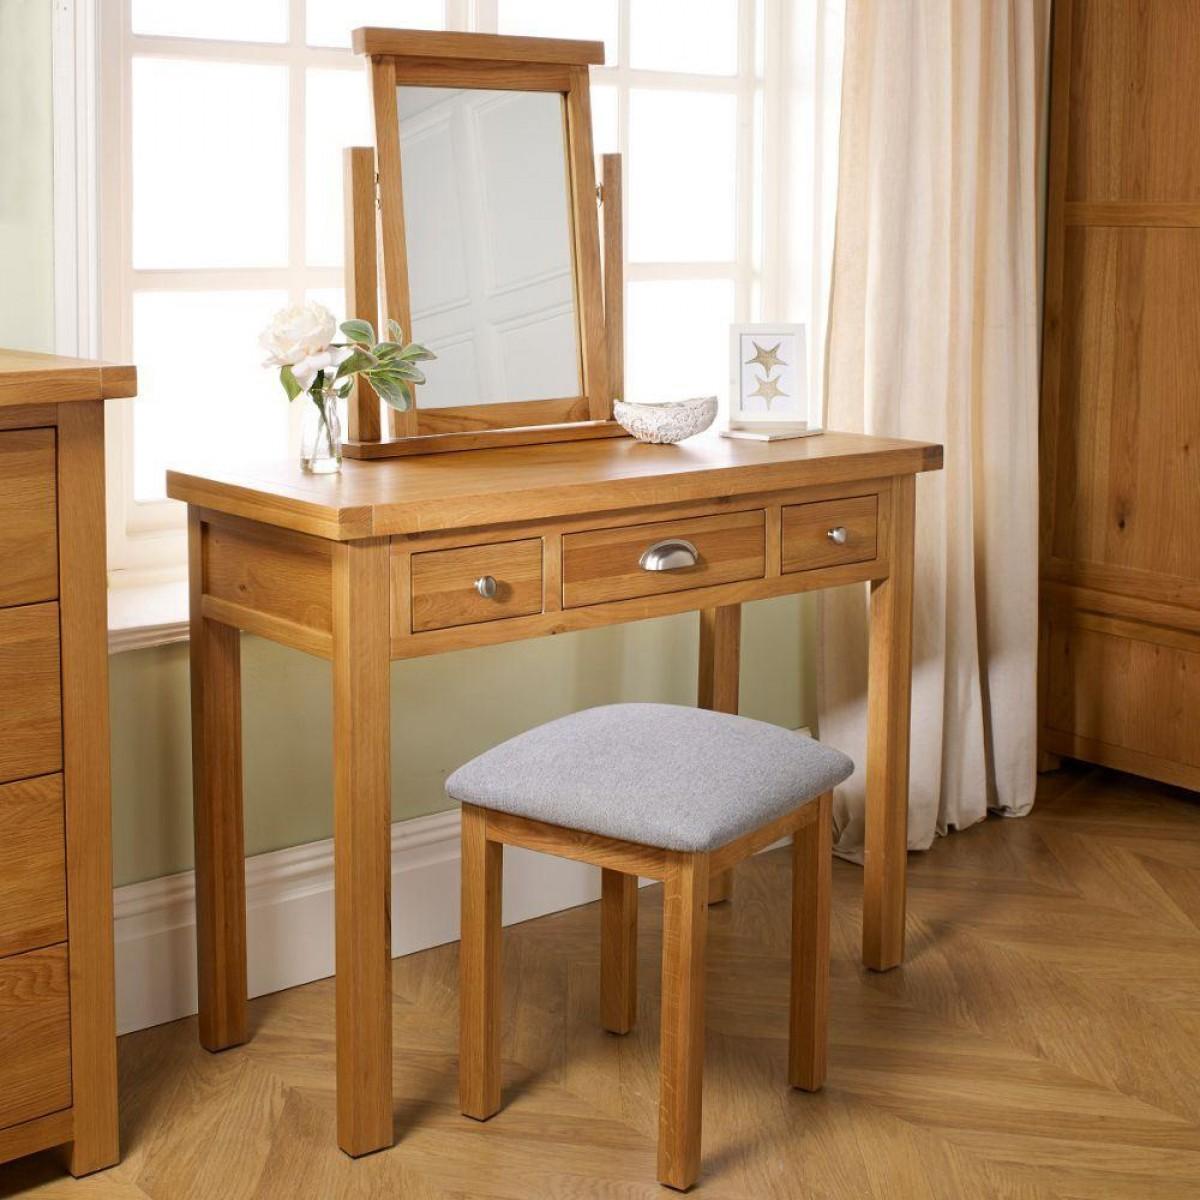 Woburn Oak Wooden 3 Drawer Dressing Table